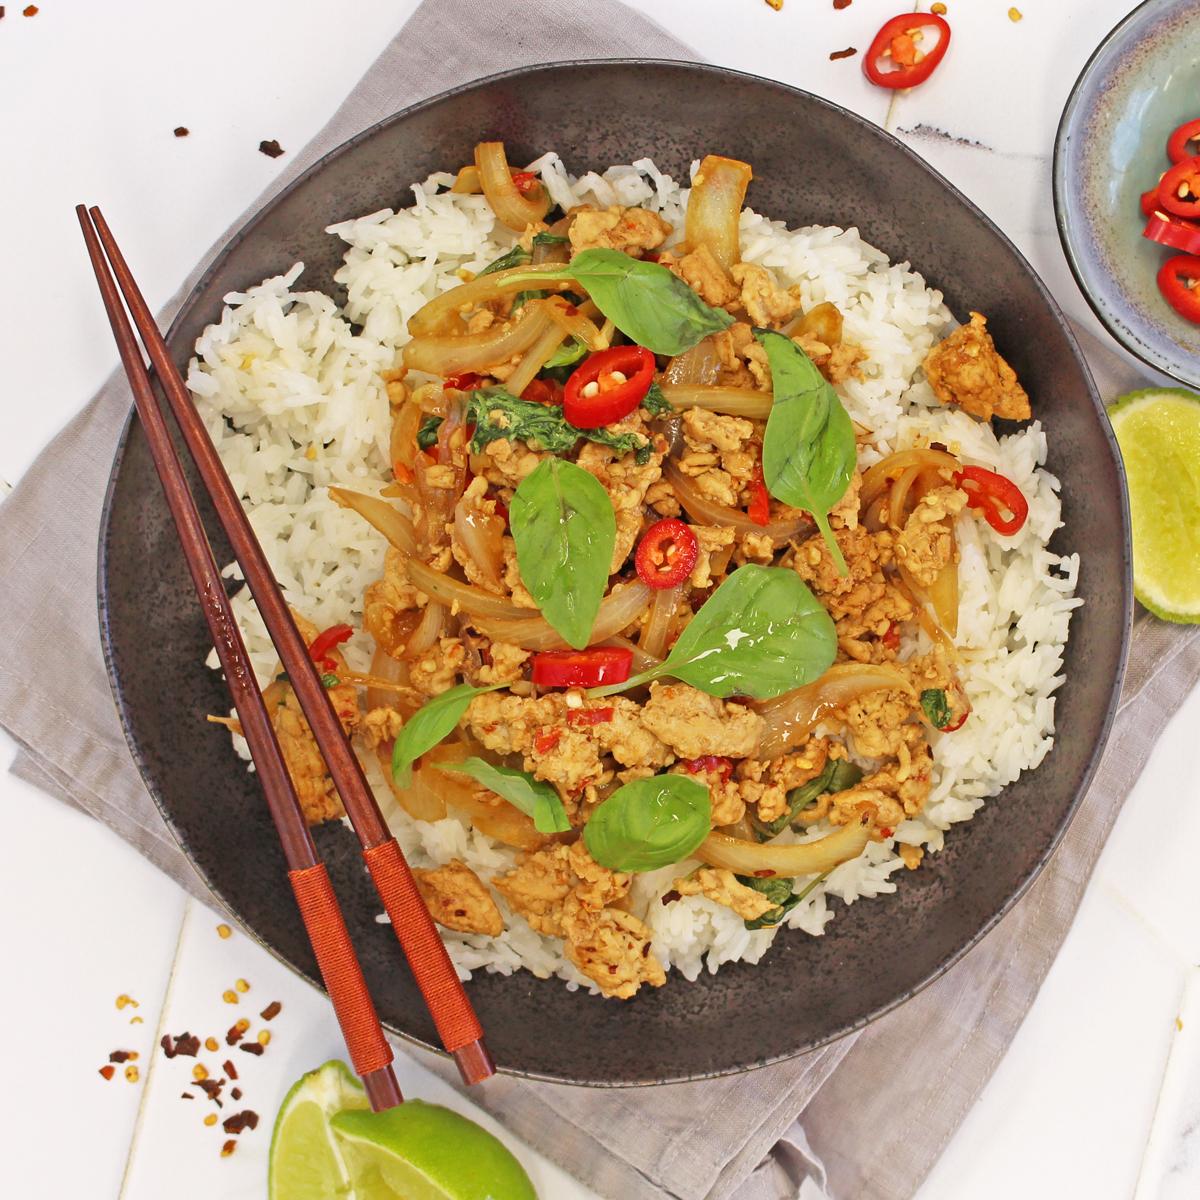 Thai Pork, Chili, Basil Stir-Fry - Pork Mince